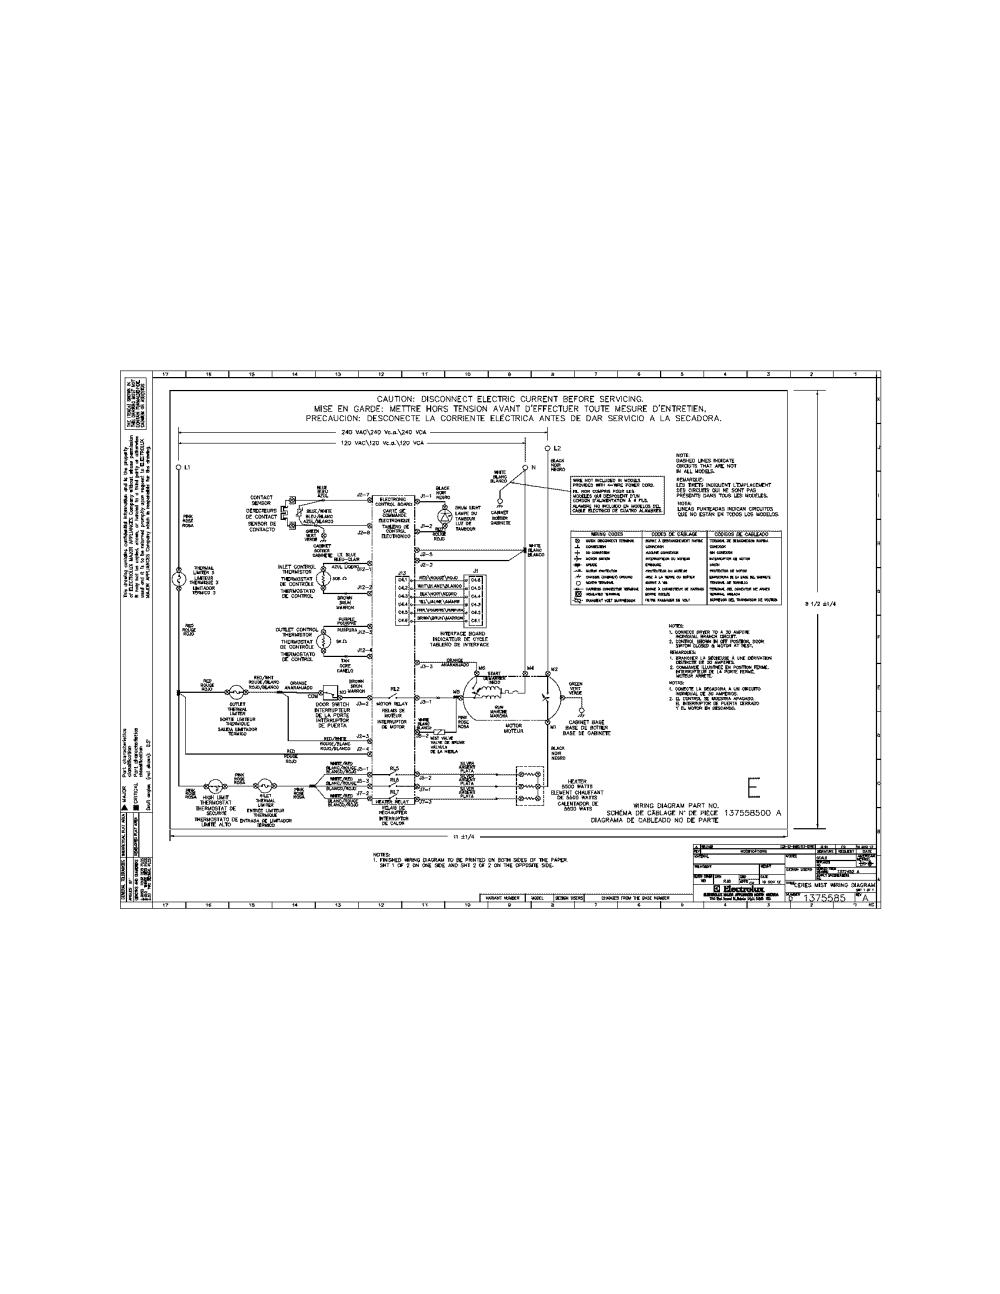 medium resolution of lawn tractors wiring diagram for electrolux best wiring diagram lawn tractors wiring diagram for electrolux